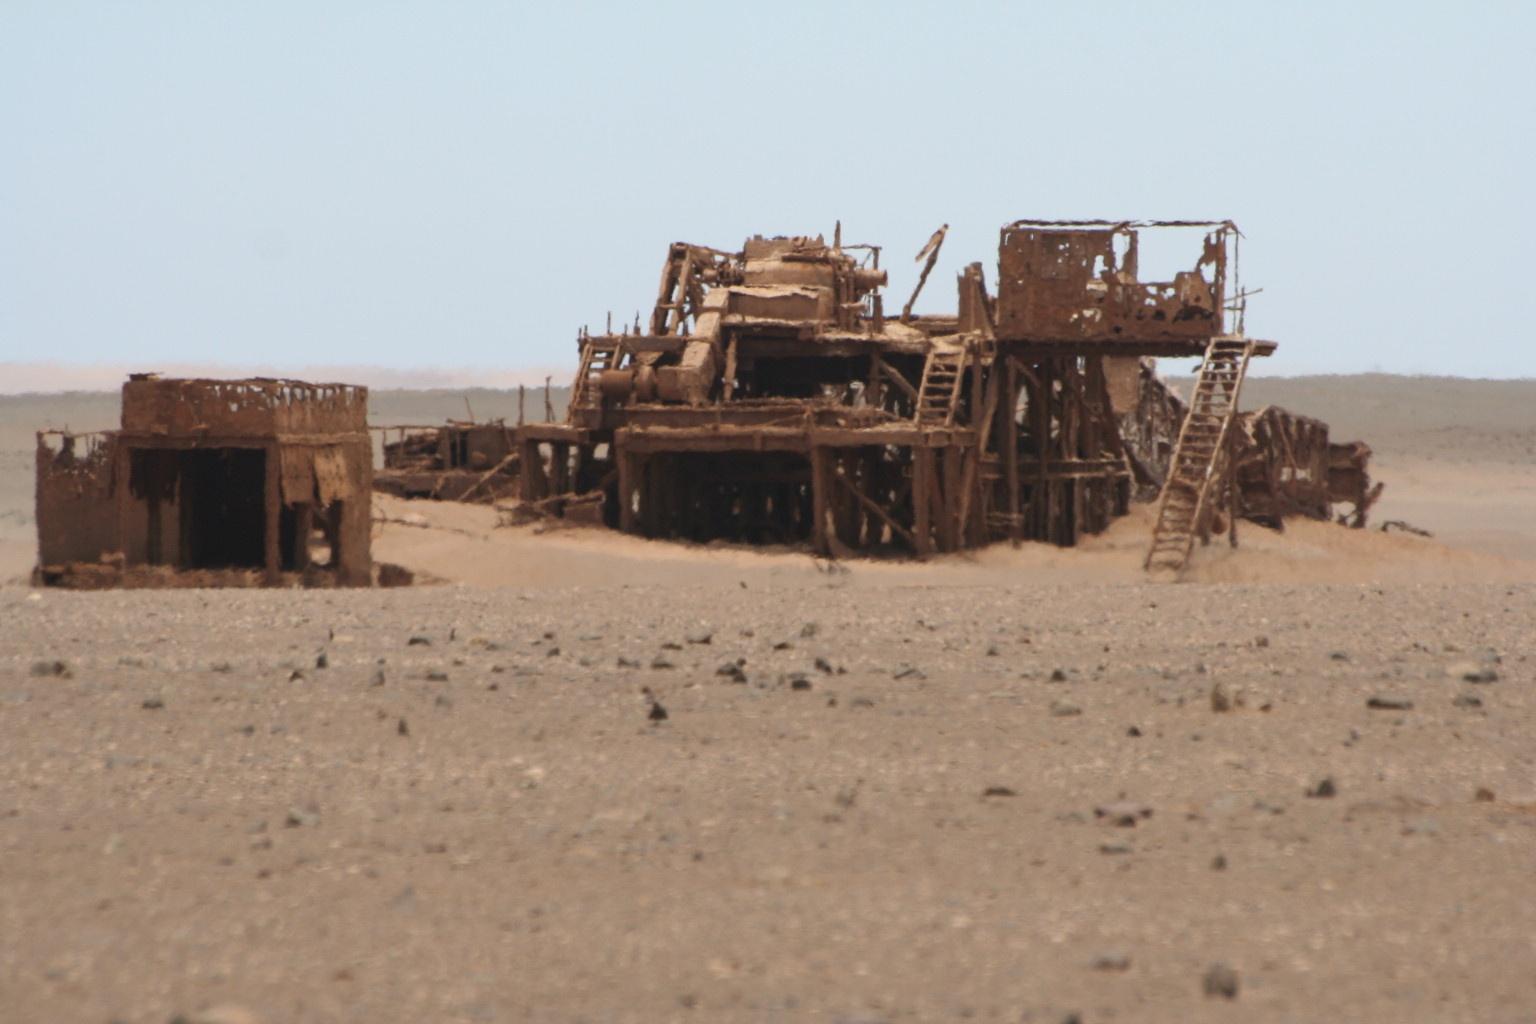 Abandoned oil rig (Skeleton Coast)